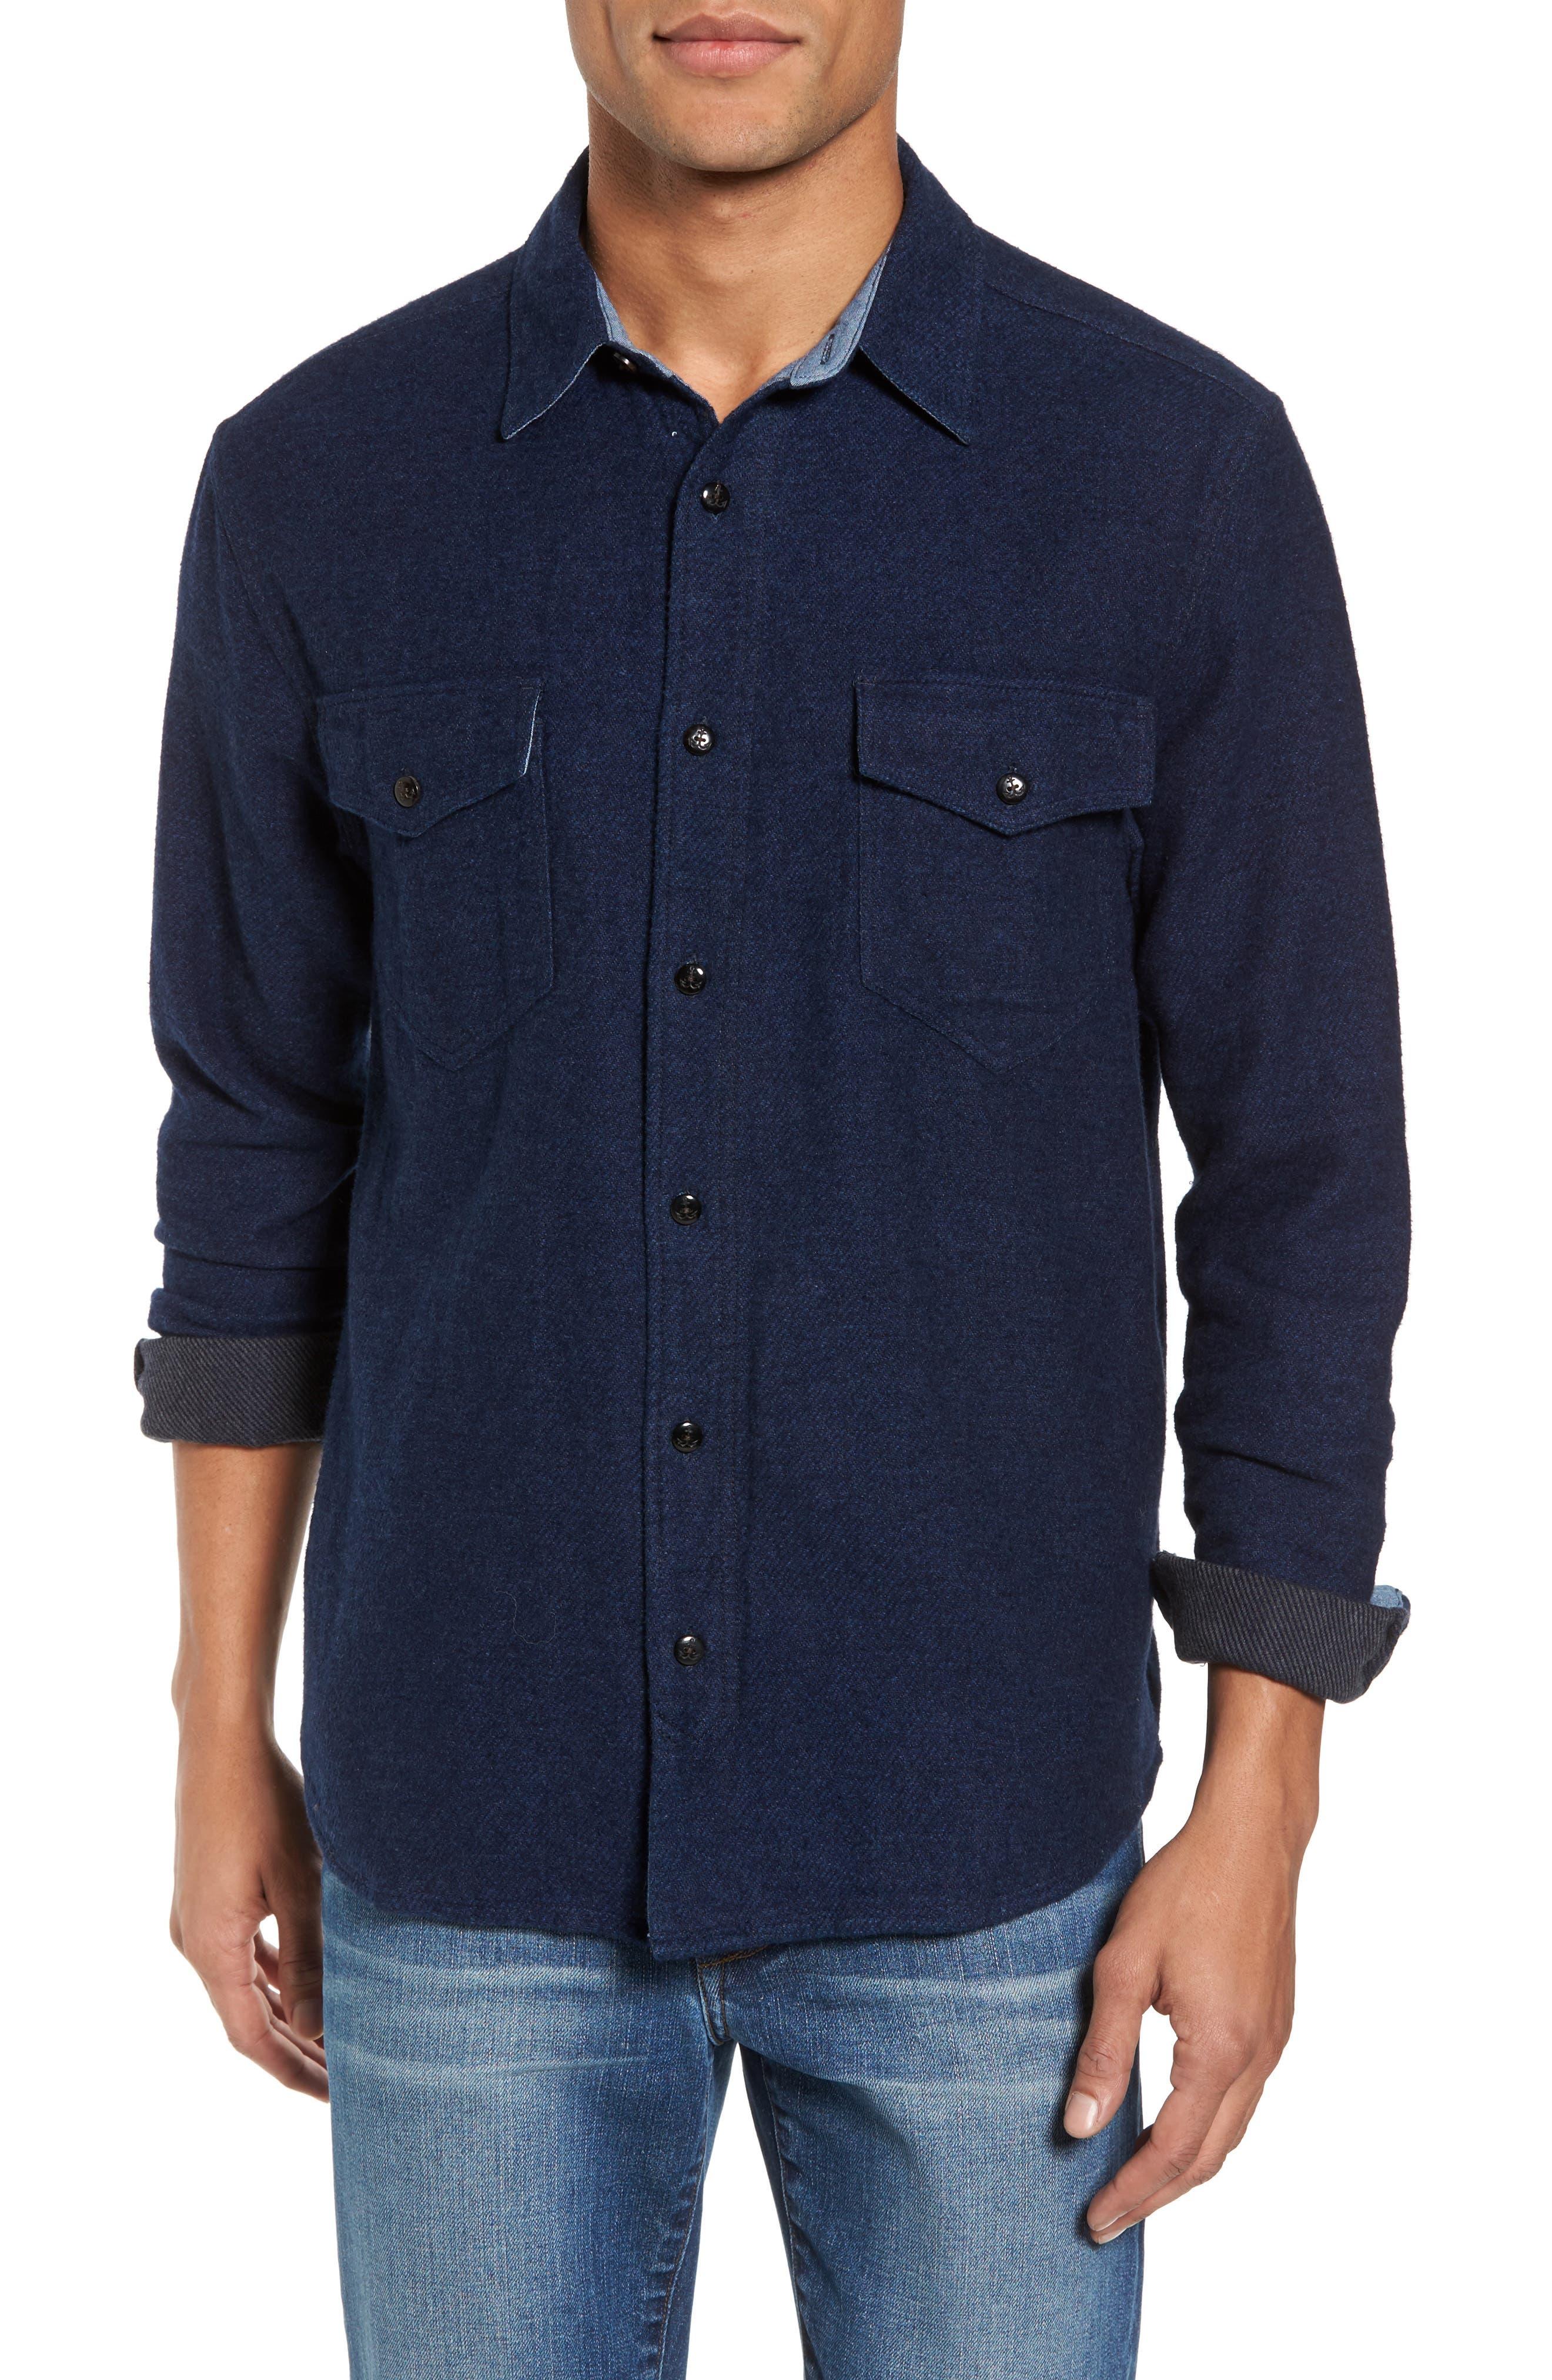 Durango Work Shirt,                         Main,                         color,